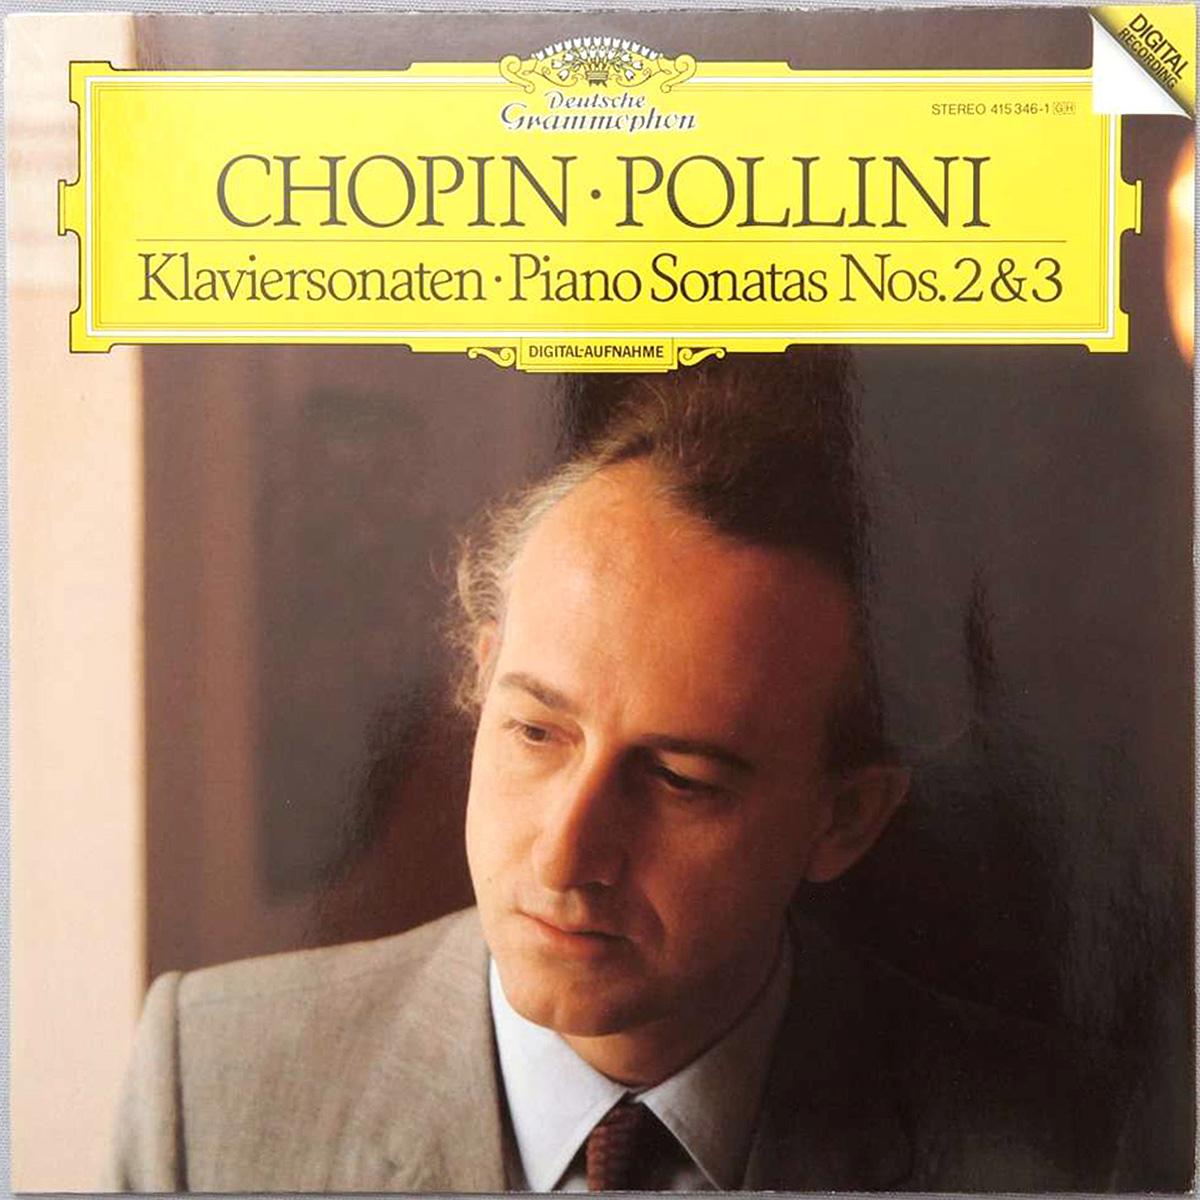 DGG 415 346 Chopin Sonates 2 & 3 Pollini DGG Digital Aufnahme